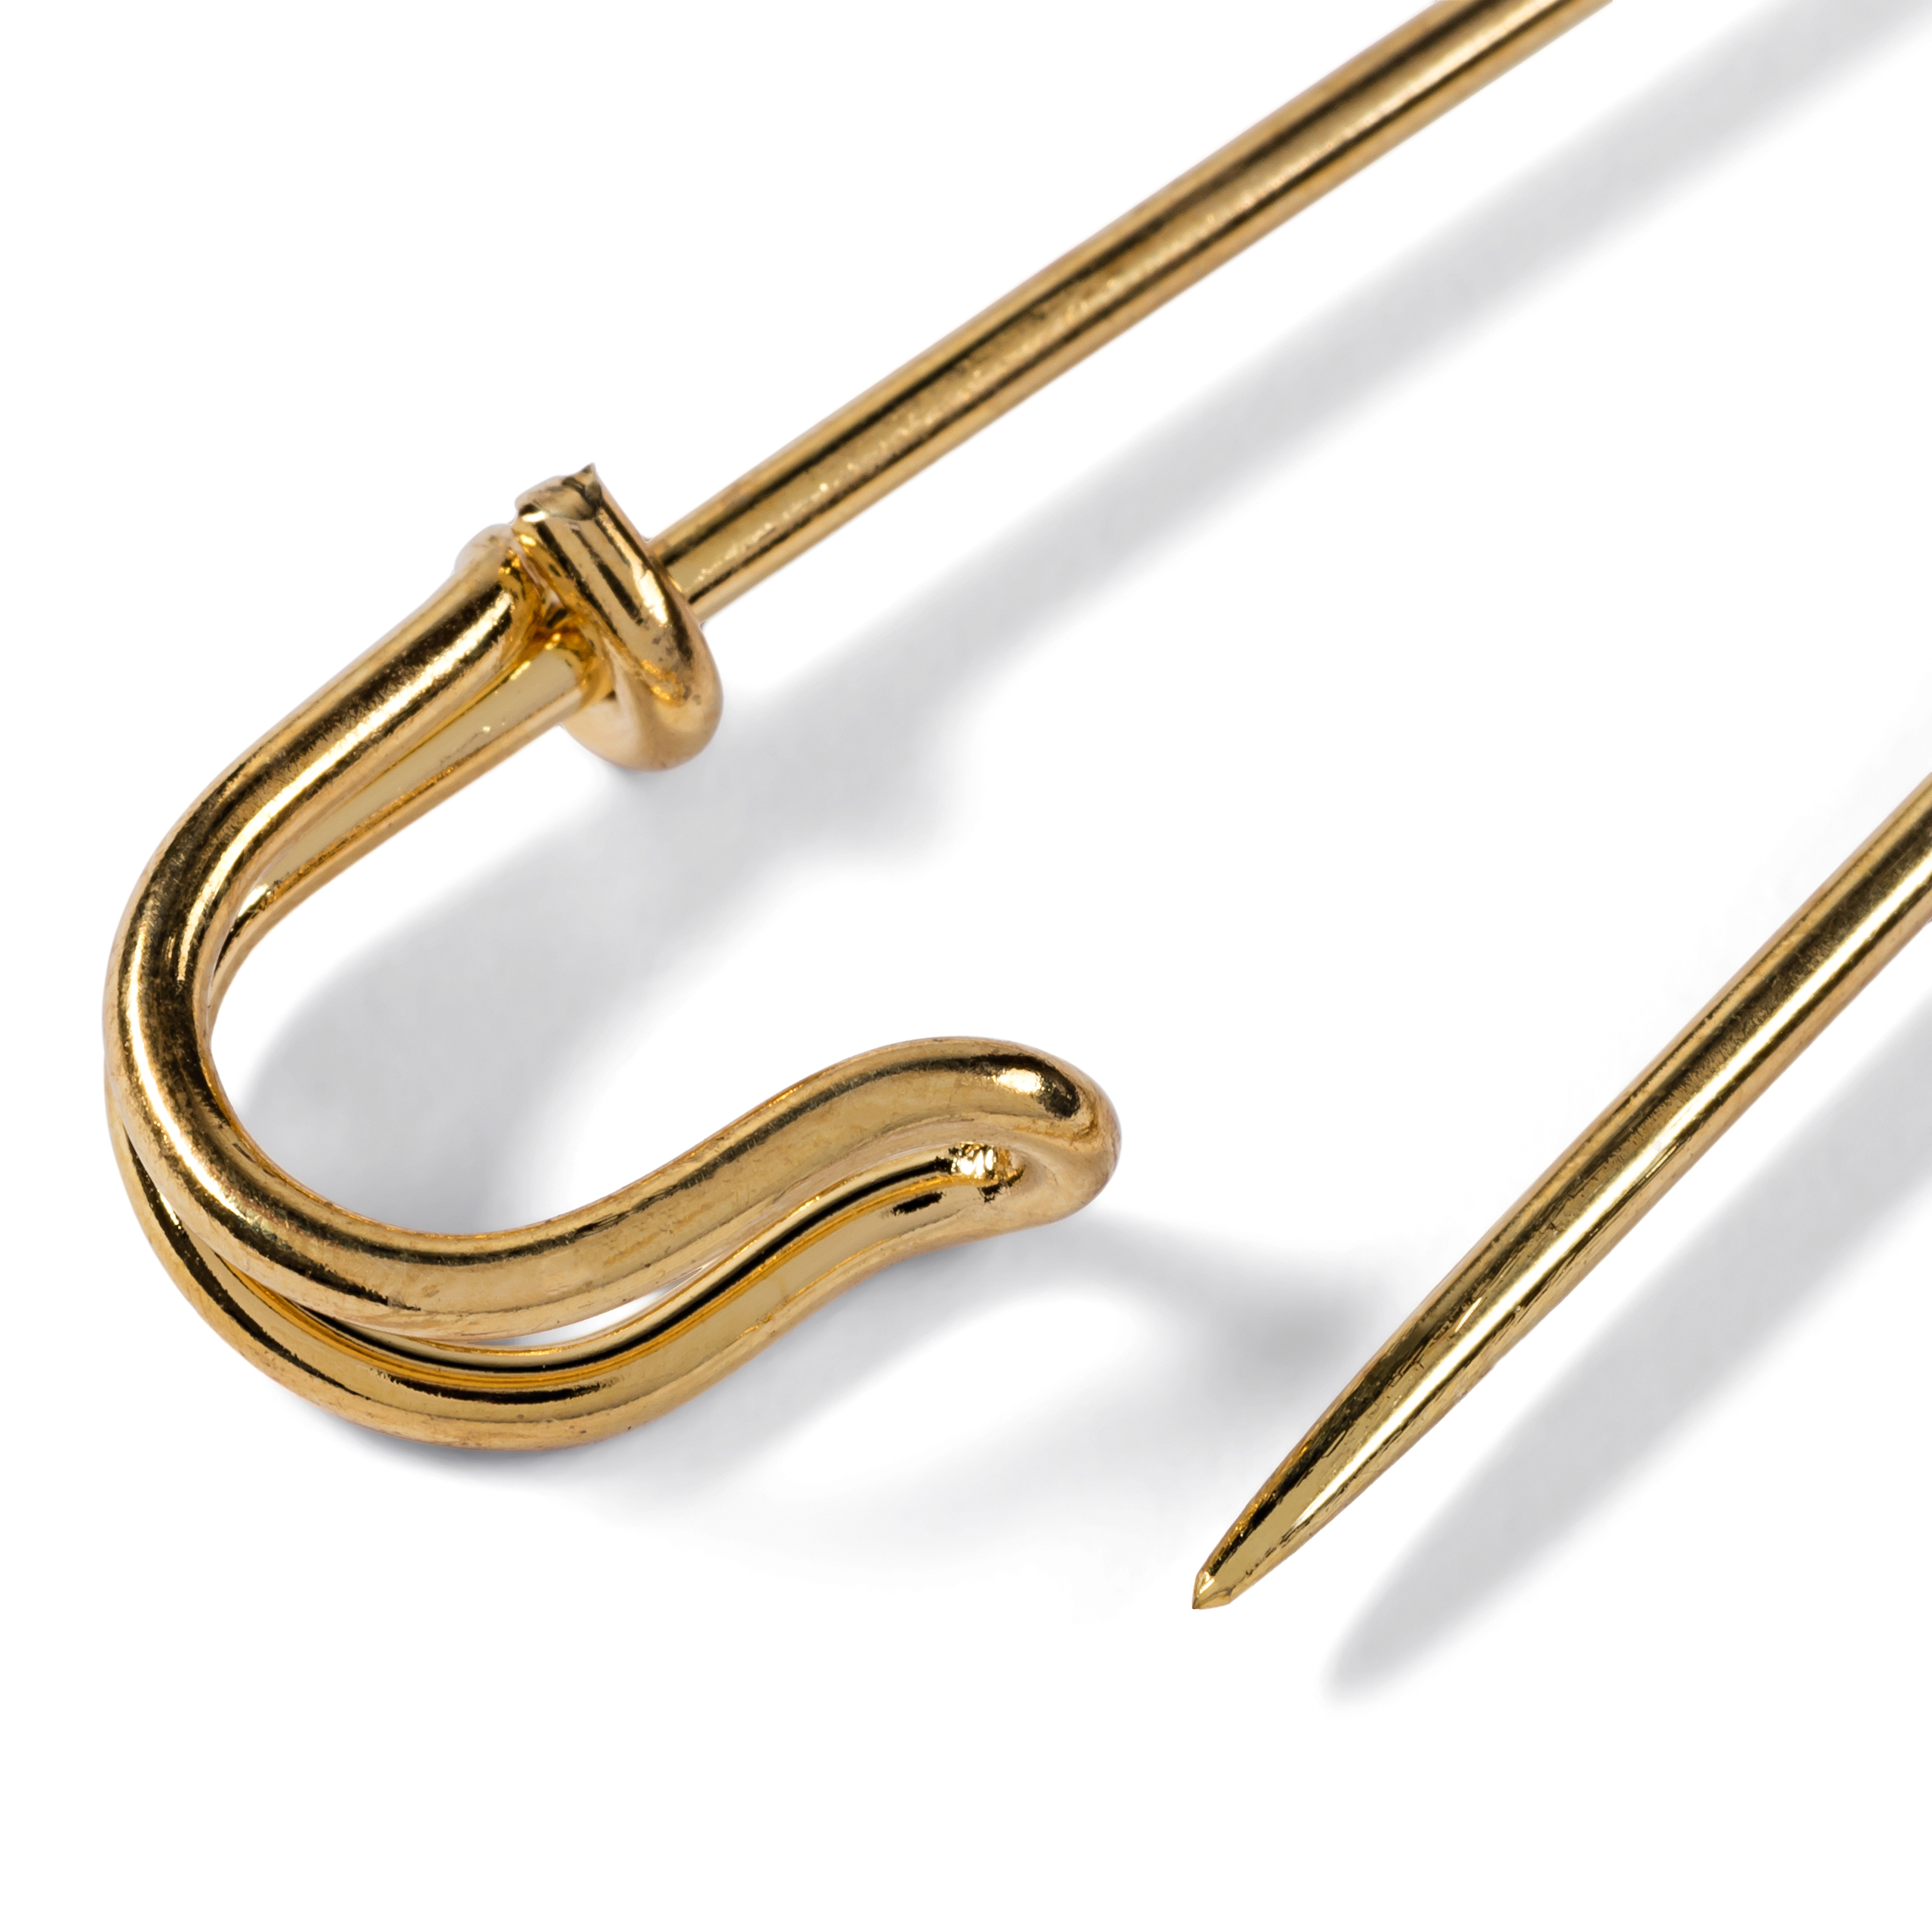 špendlík ozdobný zlatý 76mm 1ks-2